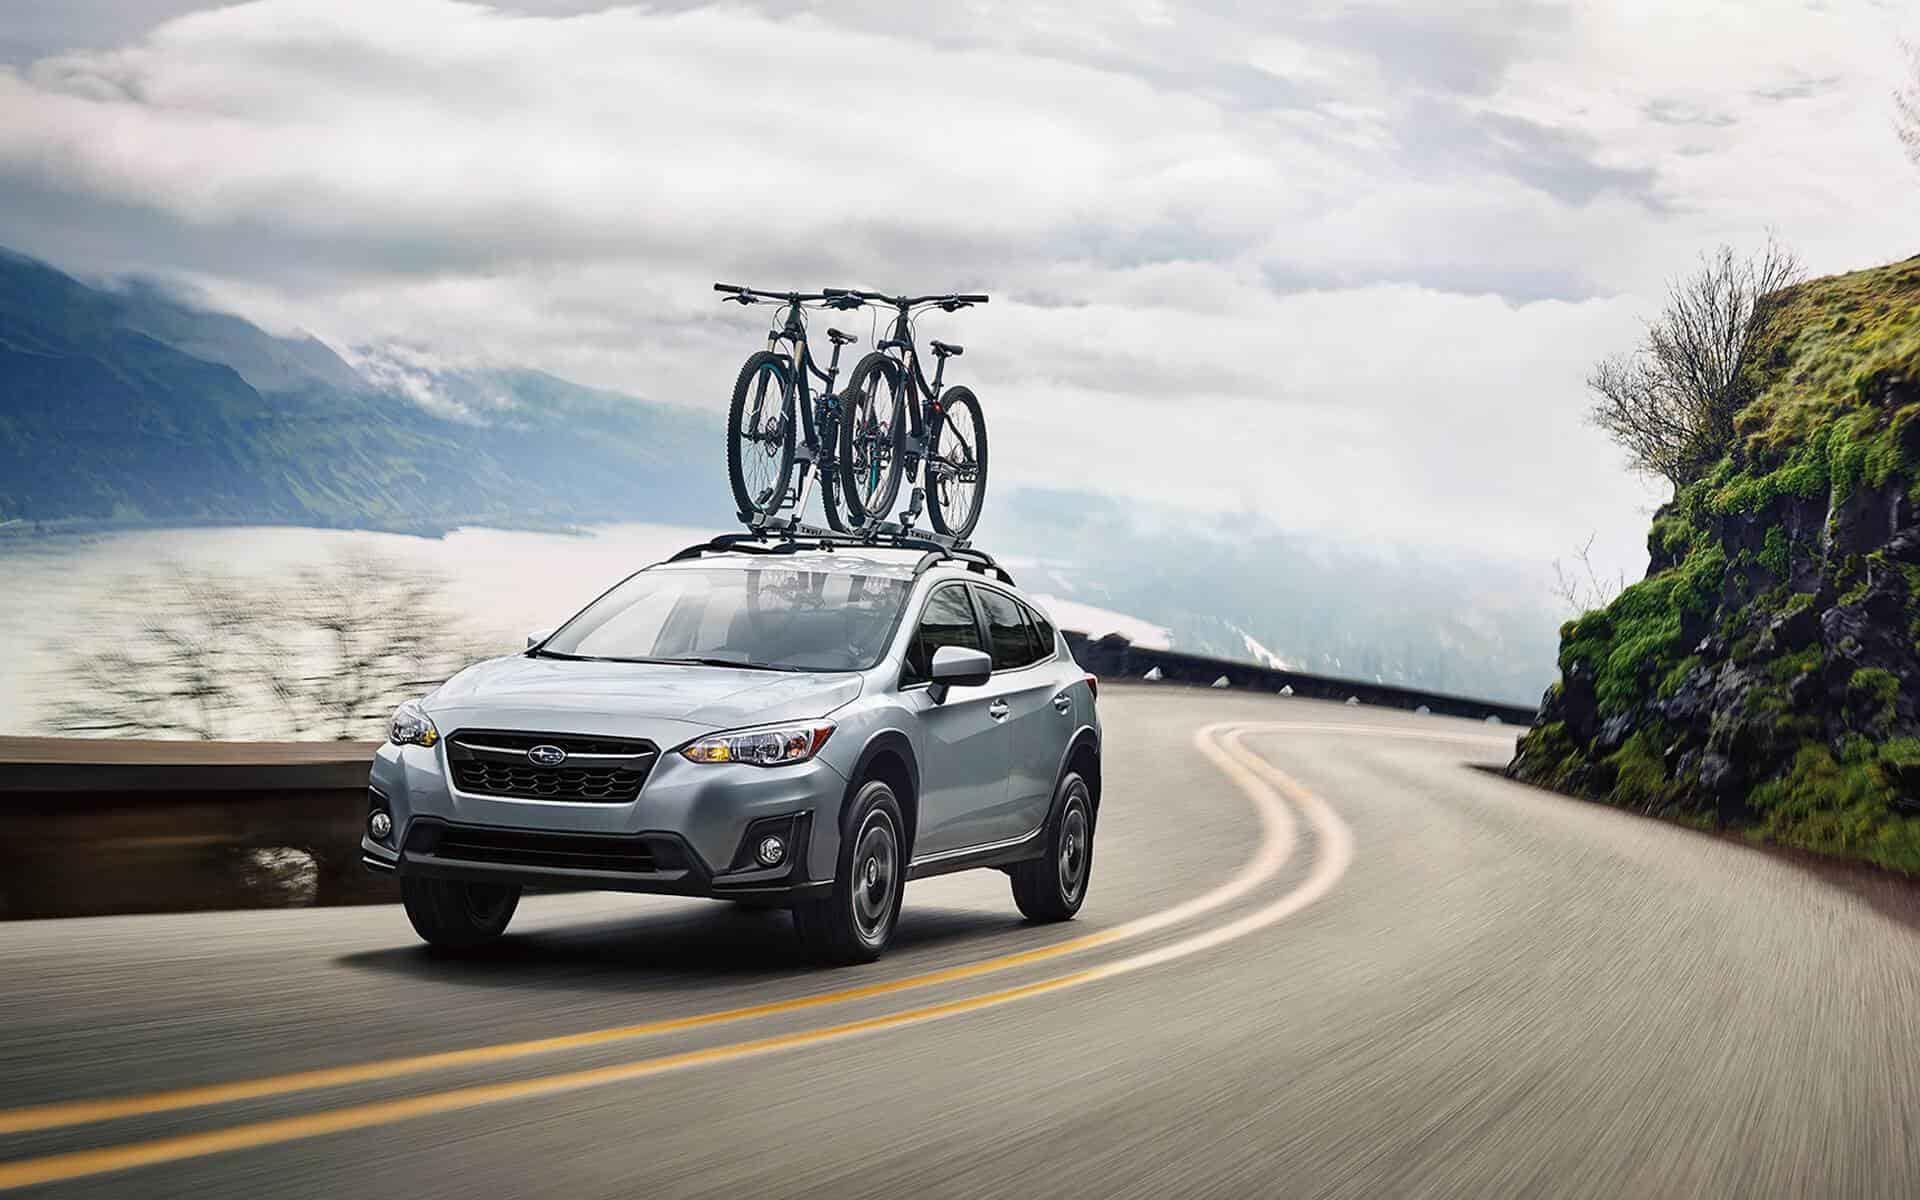 Buy a Car Online 2020 Subaru Crosstrek Near Eldorado Springs CO